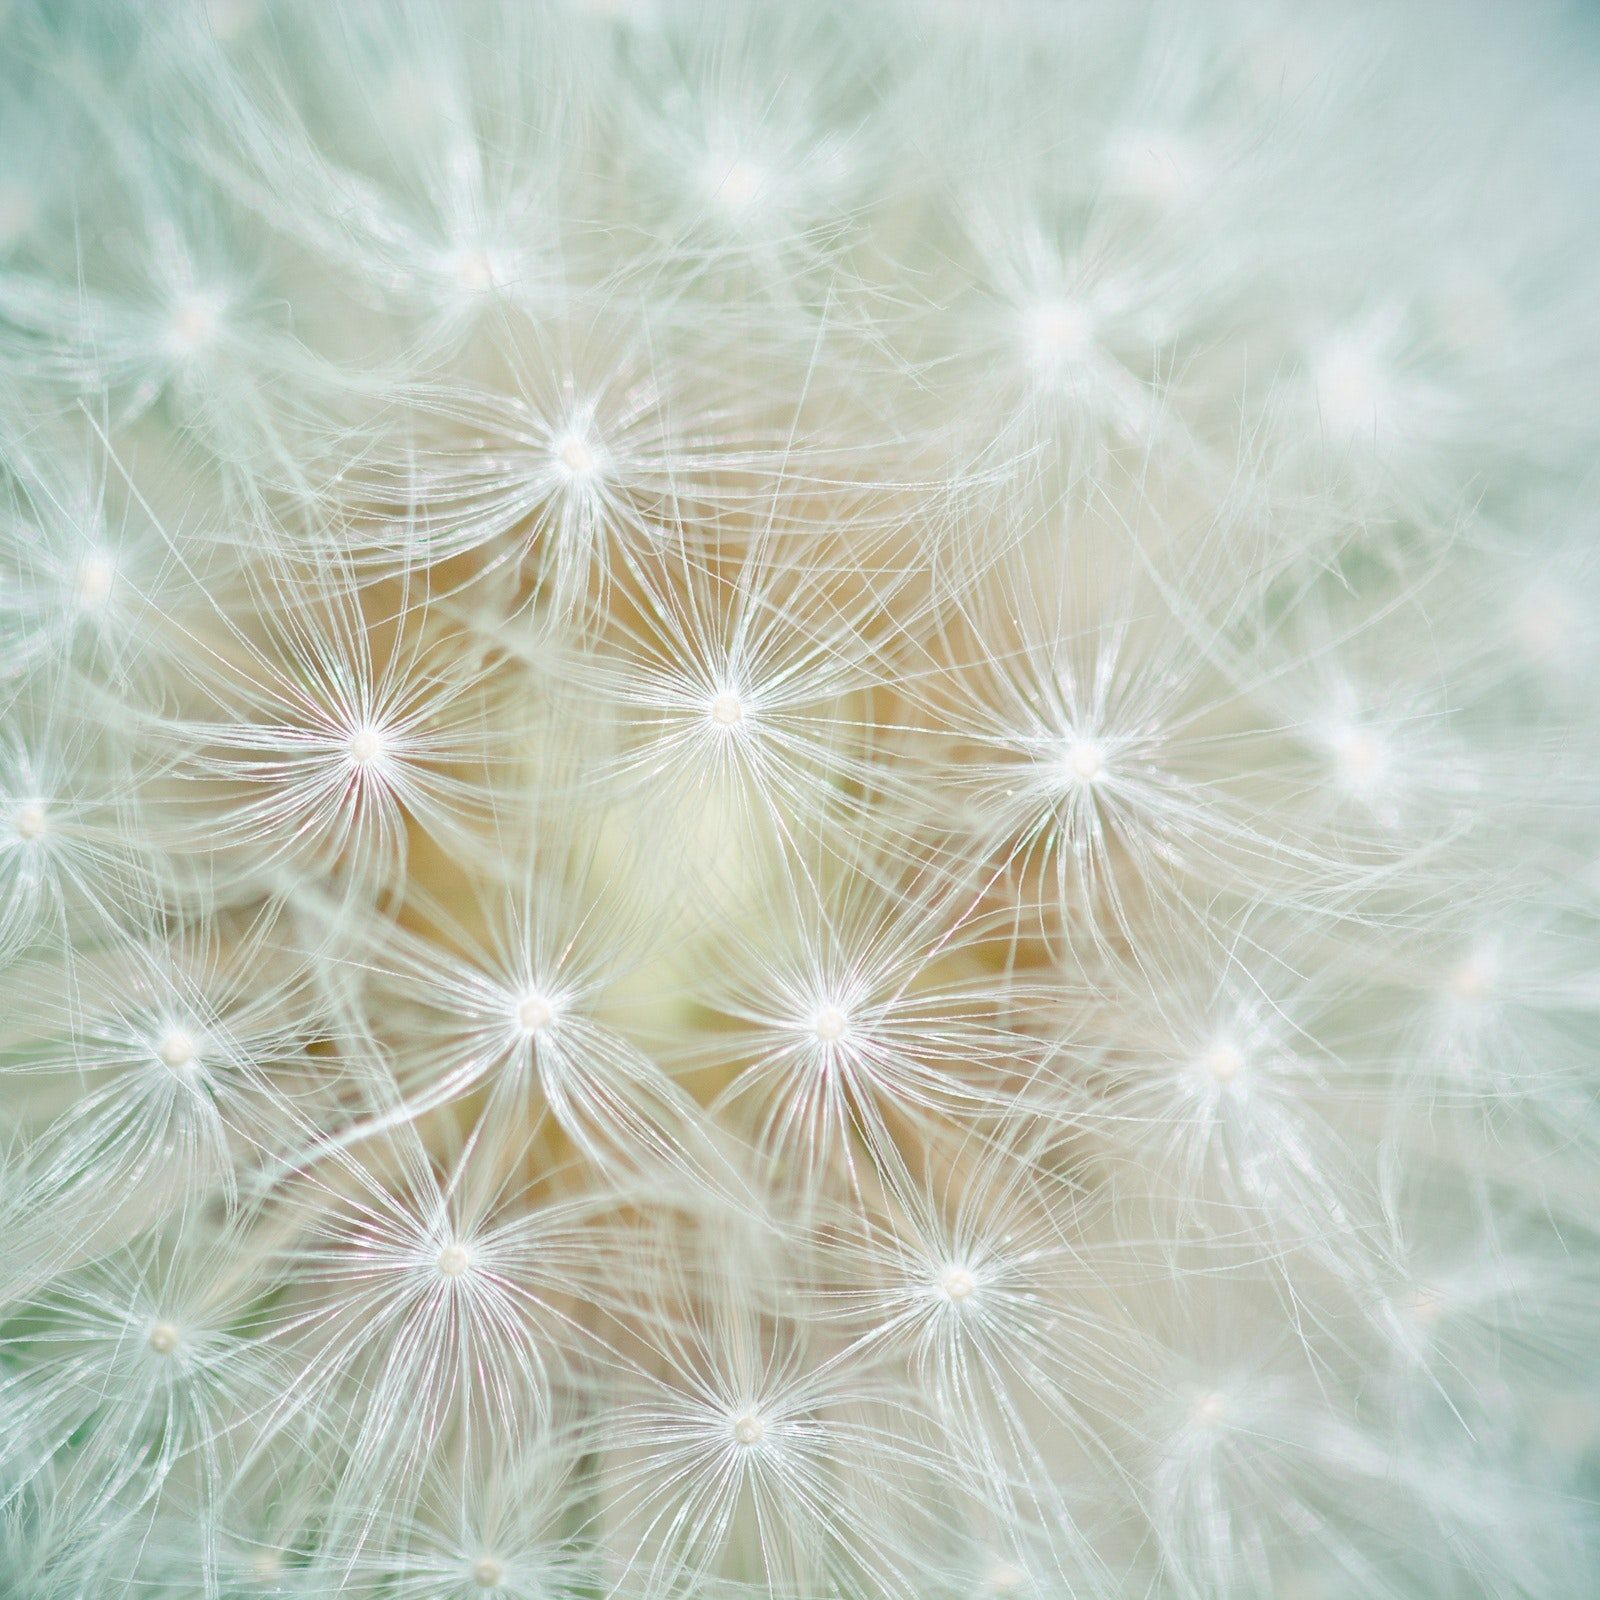 bloom-blossom-close-up-159056